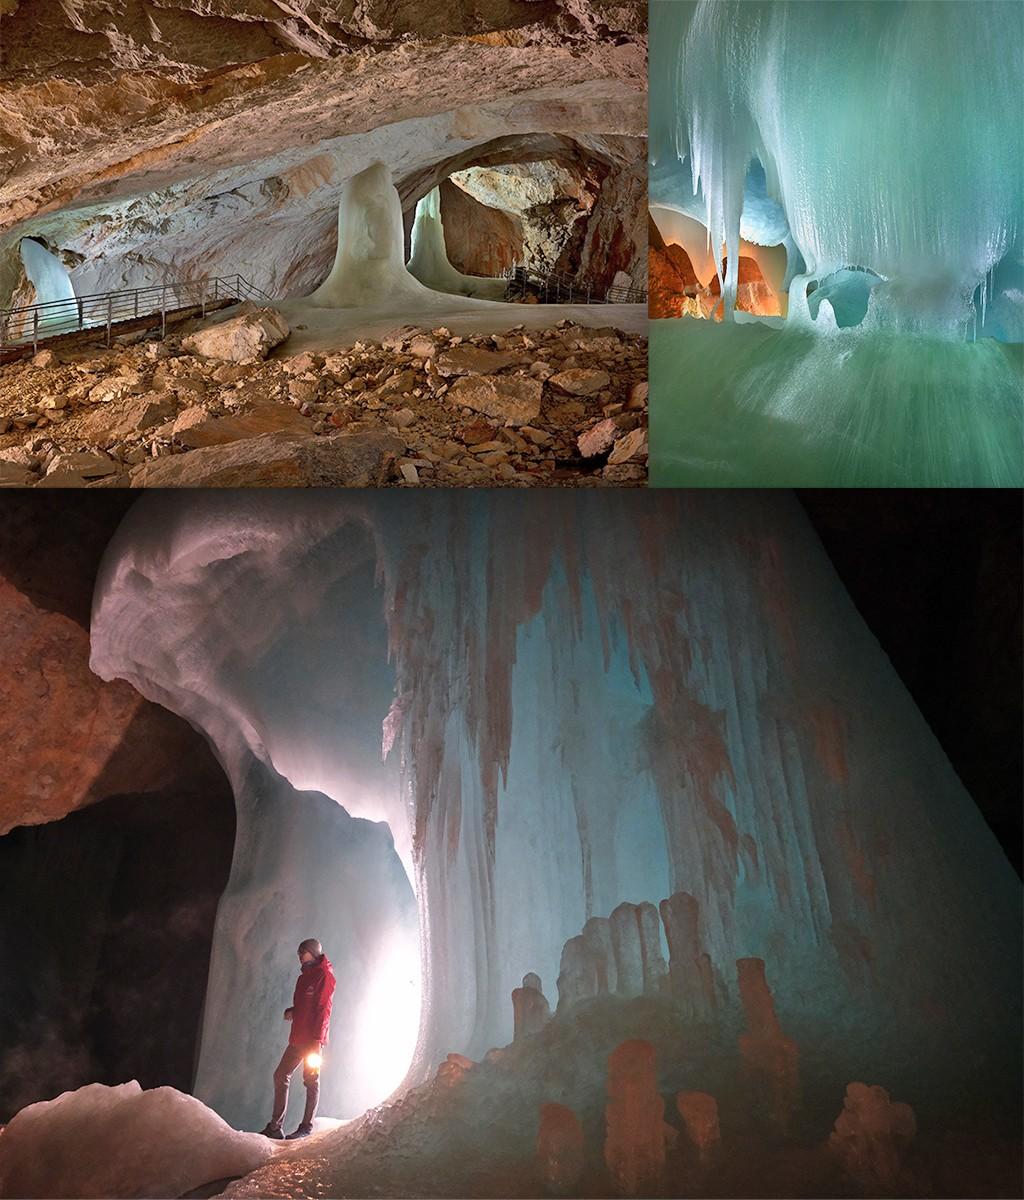 Eisriesenwelt de grootste ijsgrot ter wereld